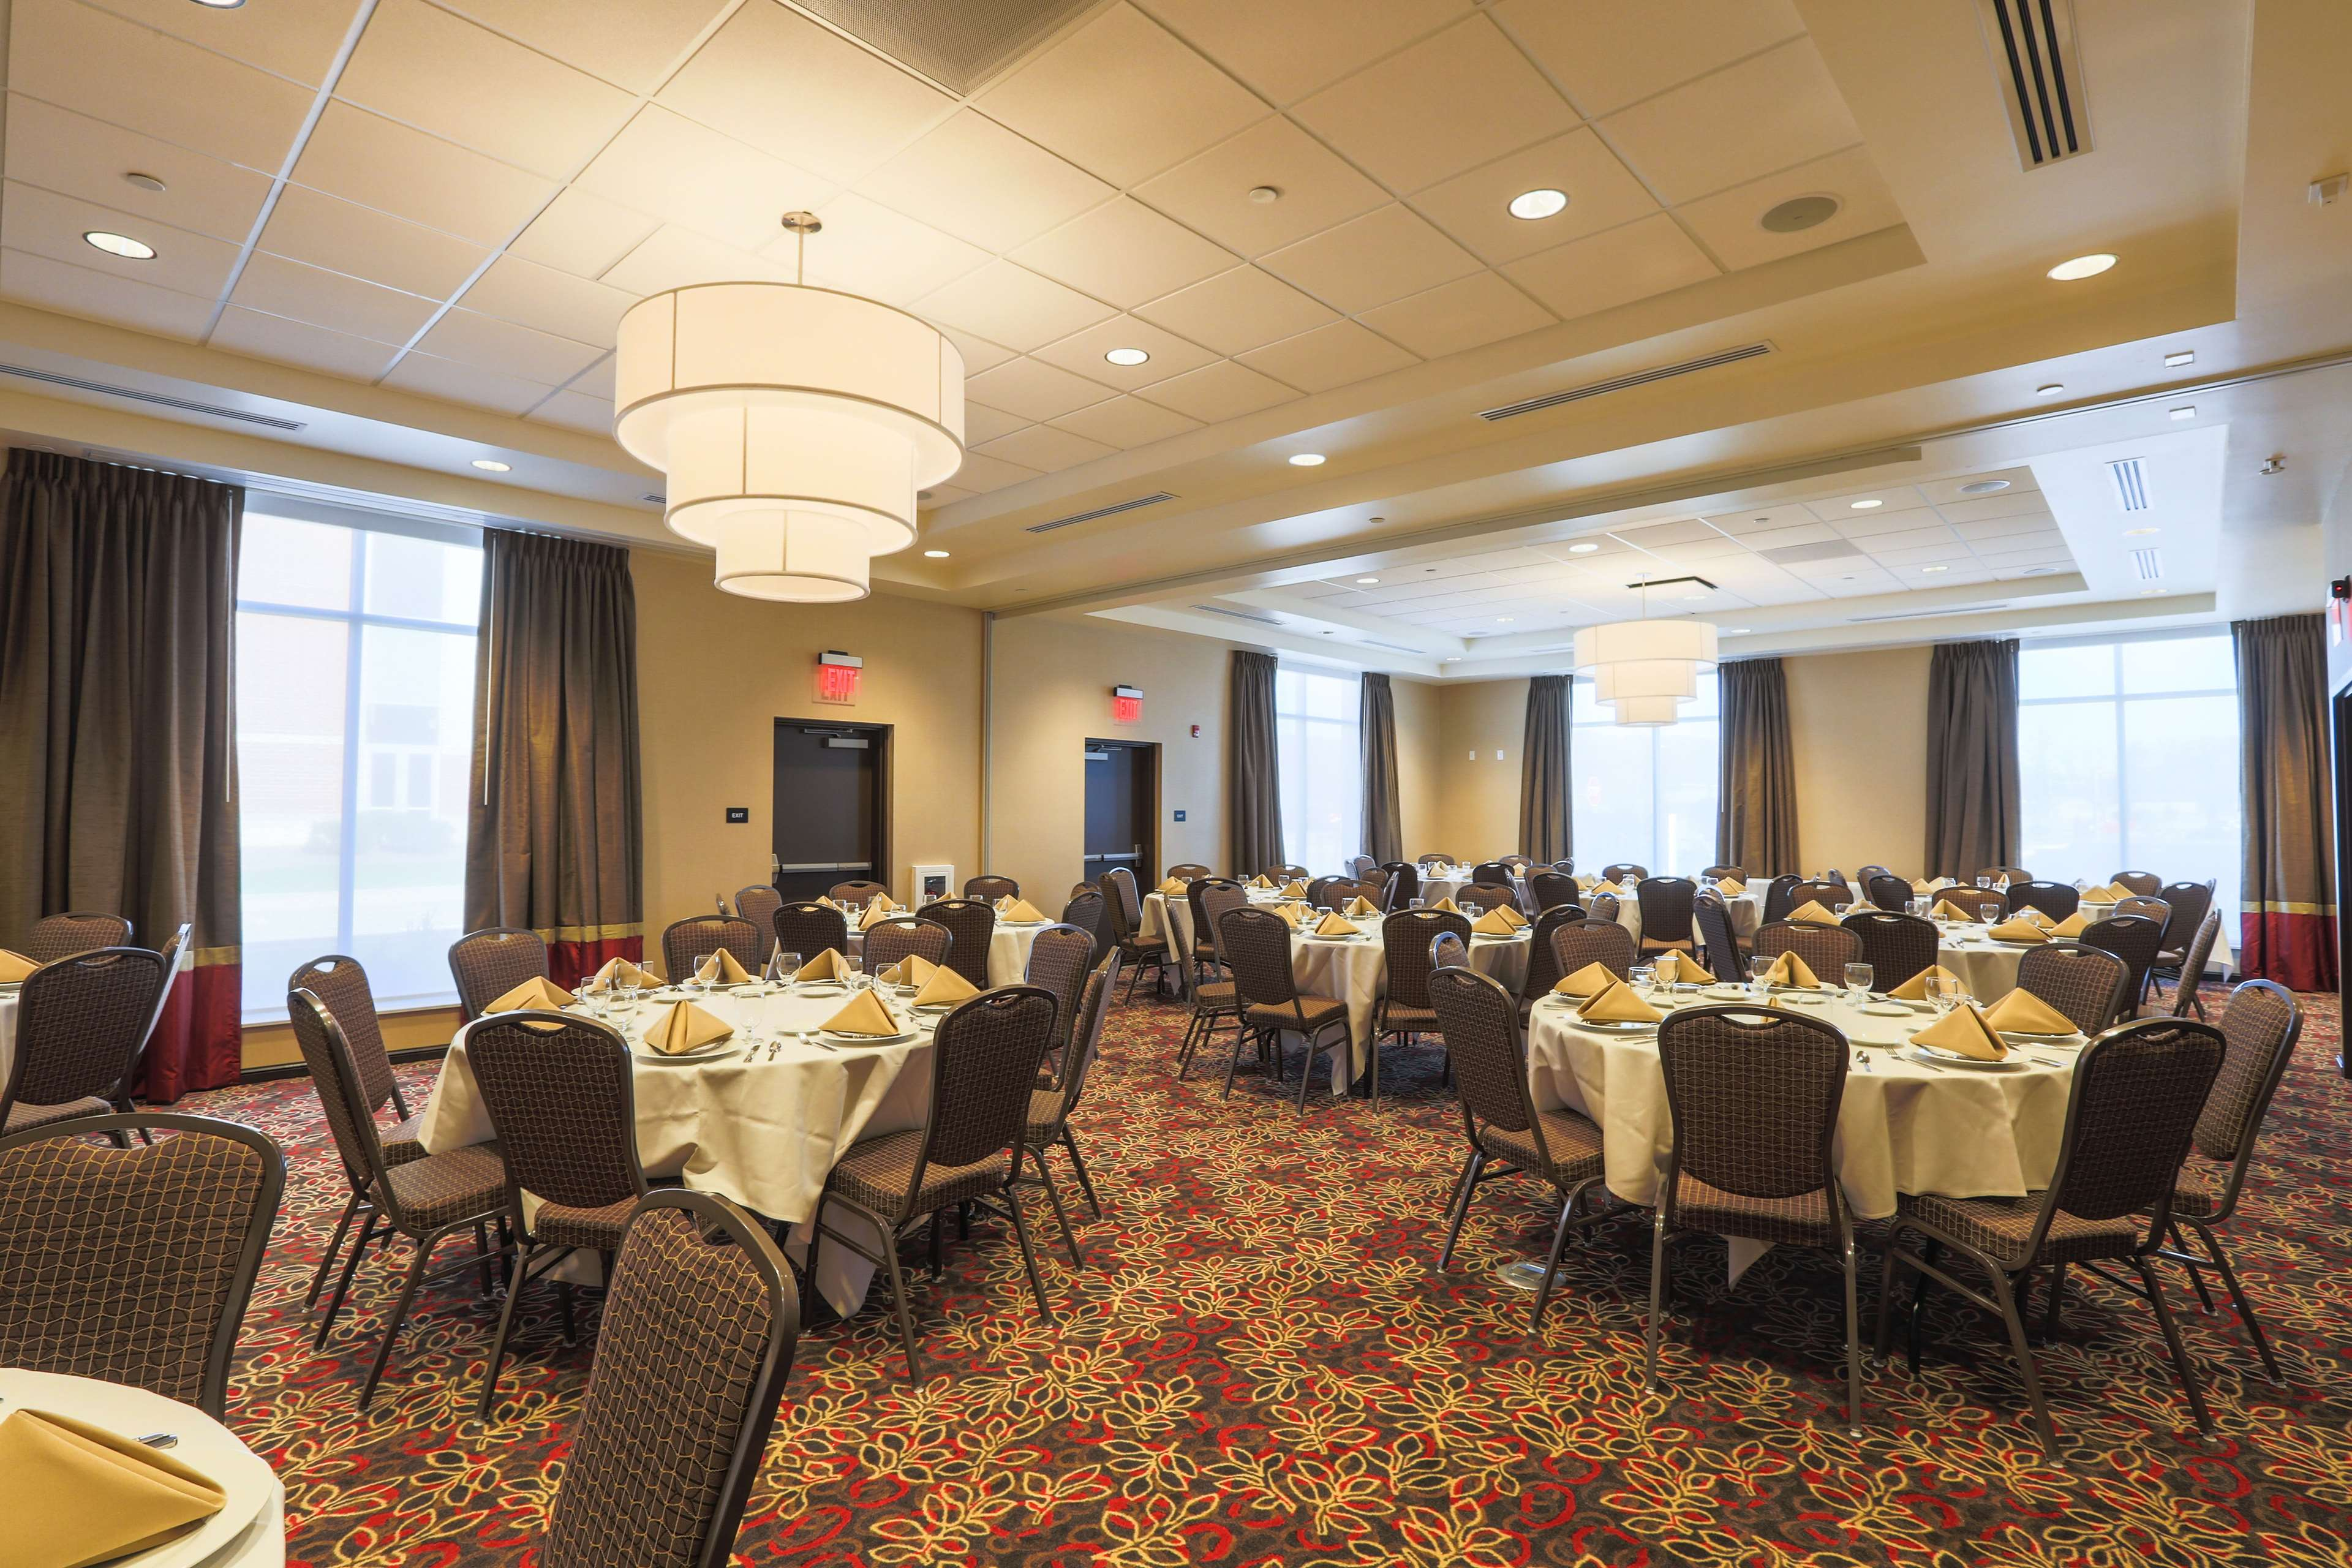 Hilton Garden Inn Indiana at IUP image 22